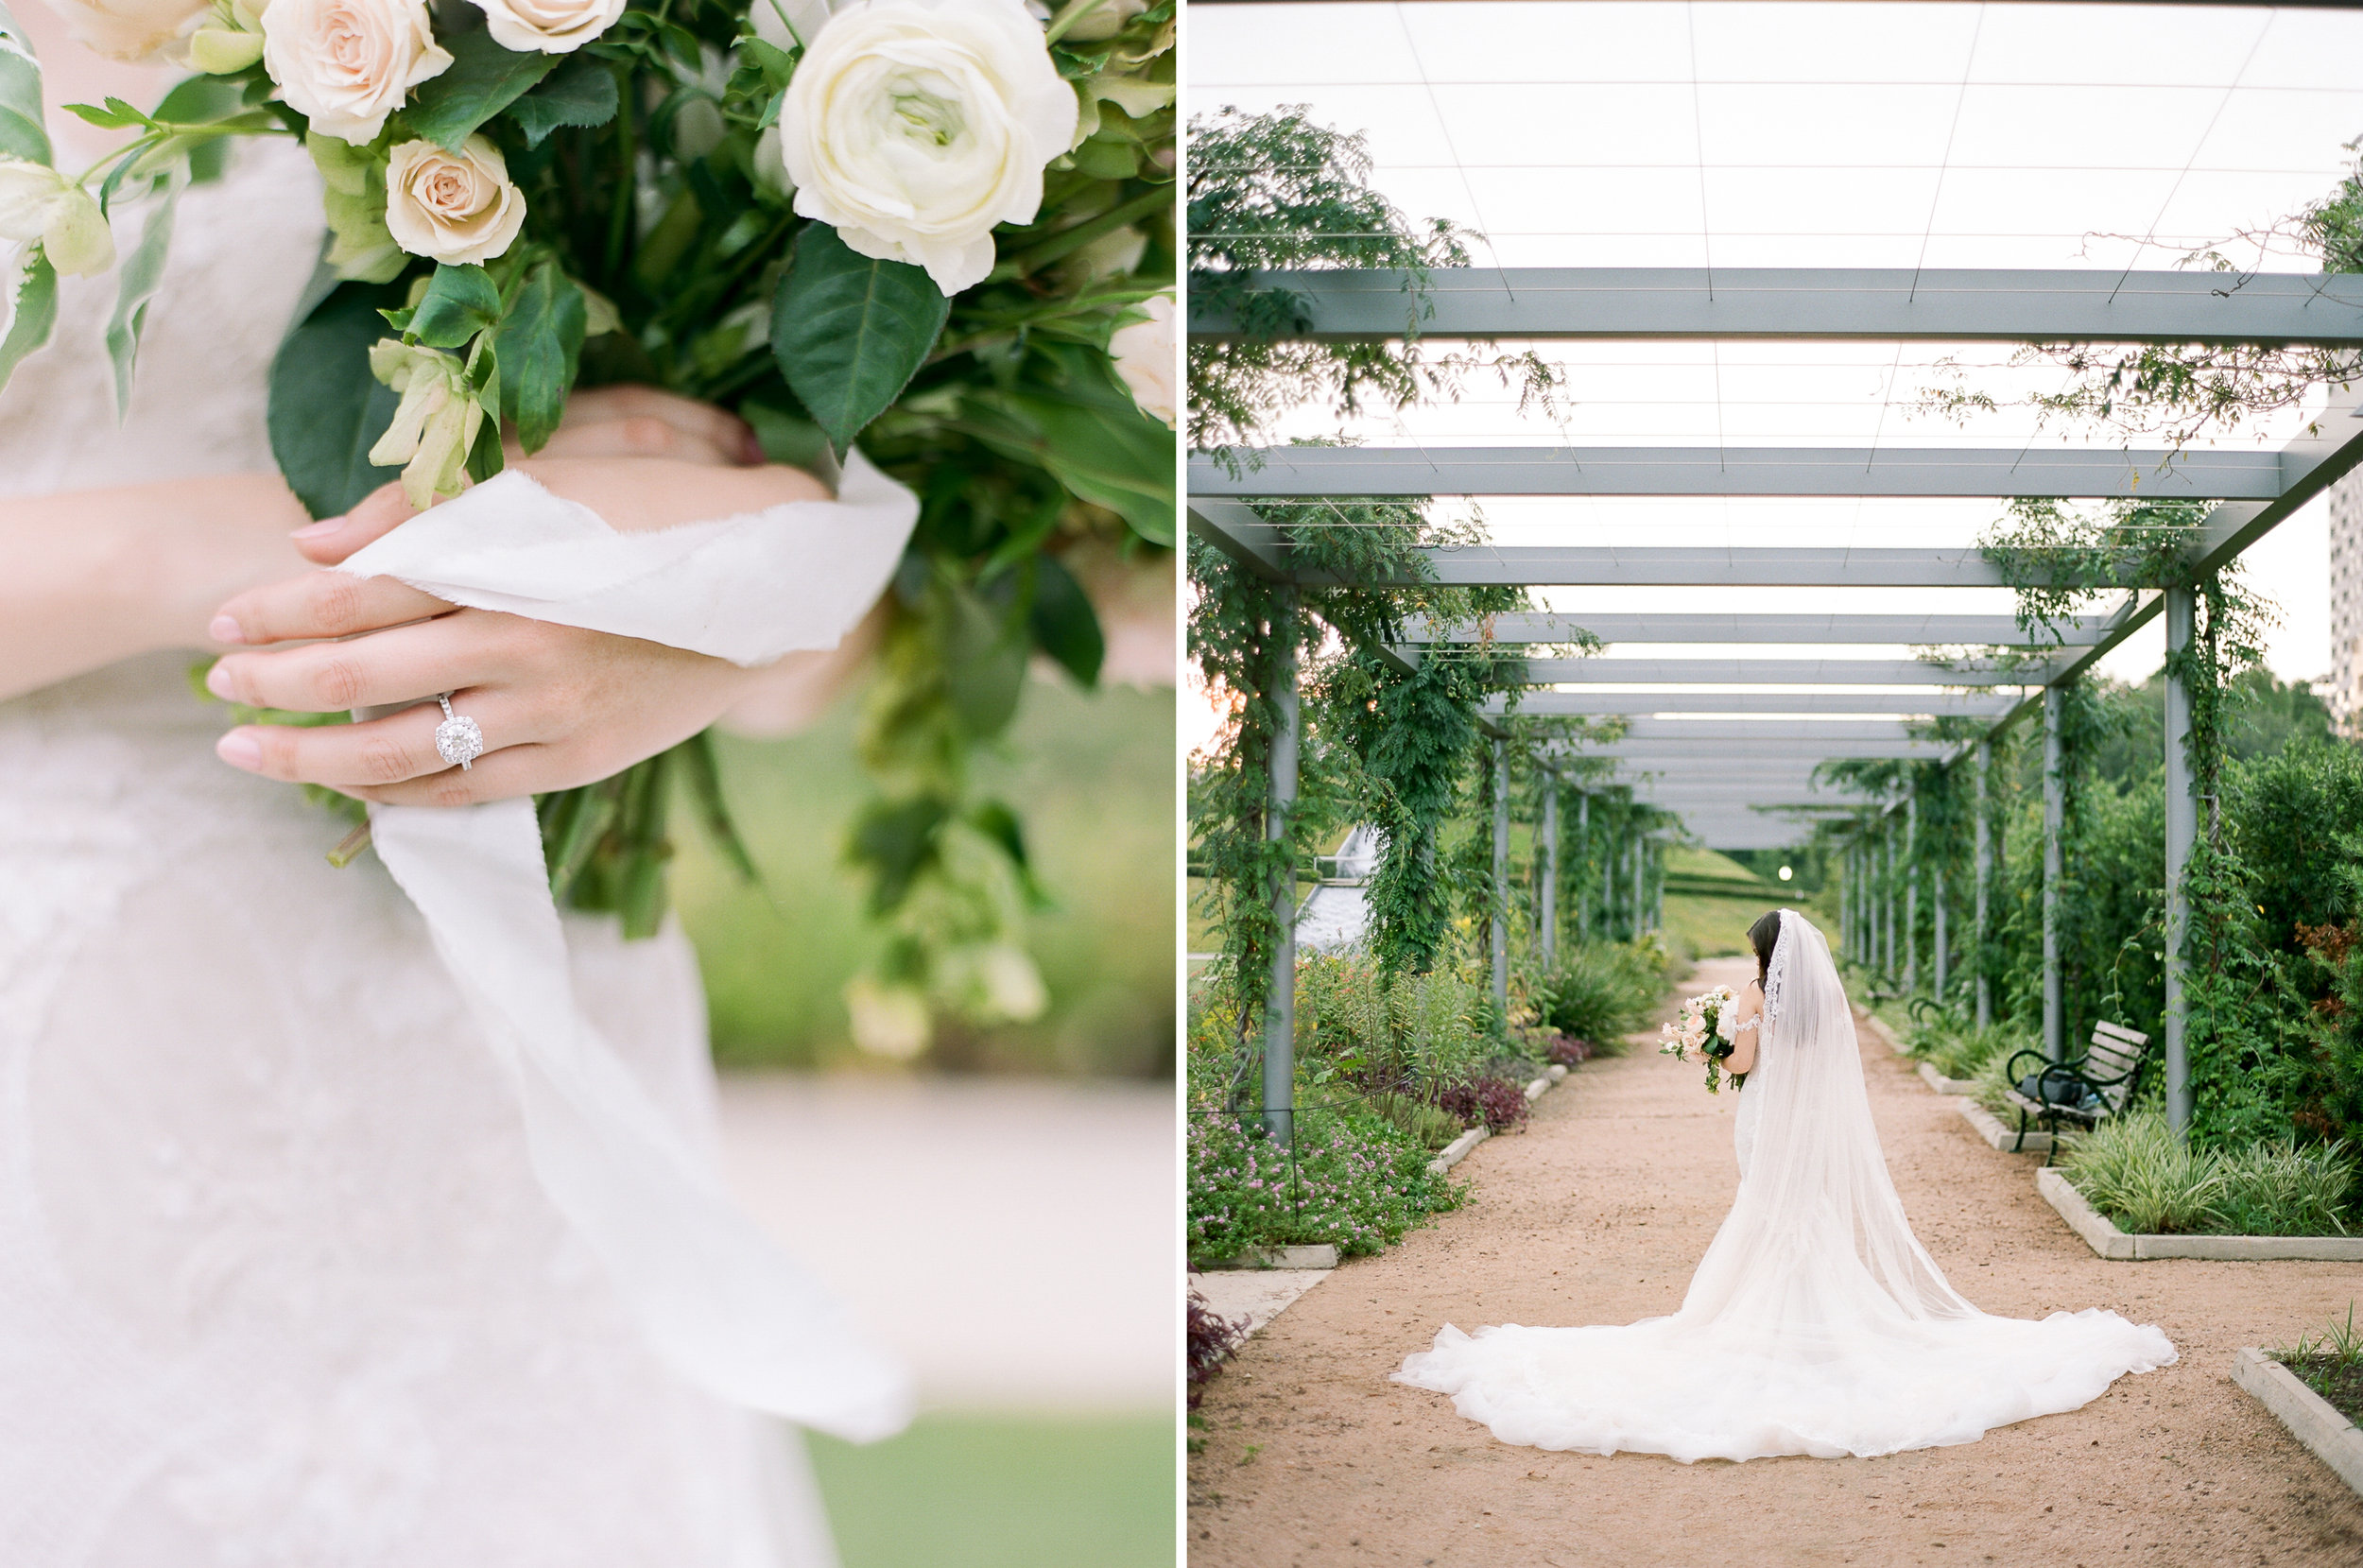 Fine-Art-Film-Houston-Wedding-Photographer-Best-Top-Luxury-Texas-Austin-Dallas-Destination-Dana-Fernandez-Photography-Portrait-Bridals-McGovern-Centennial-Gardens-105.jpg